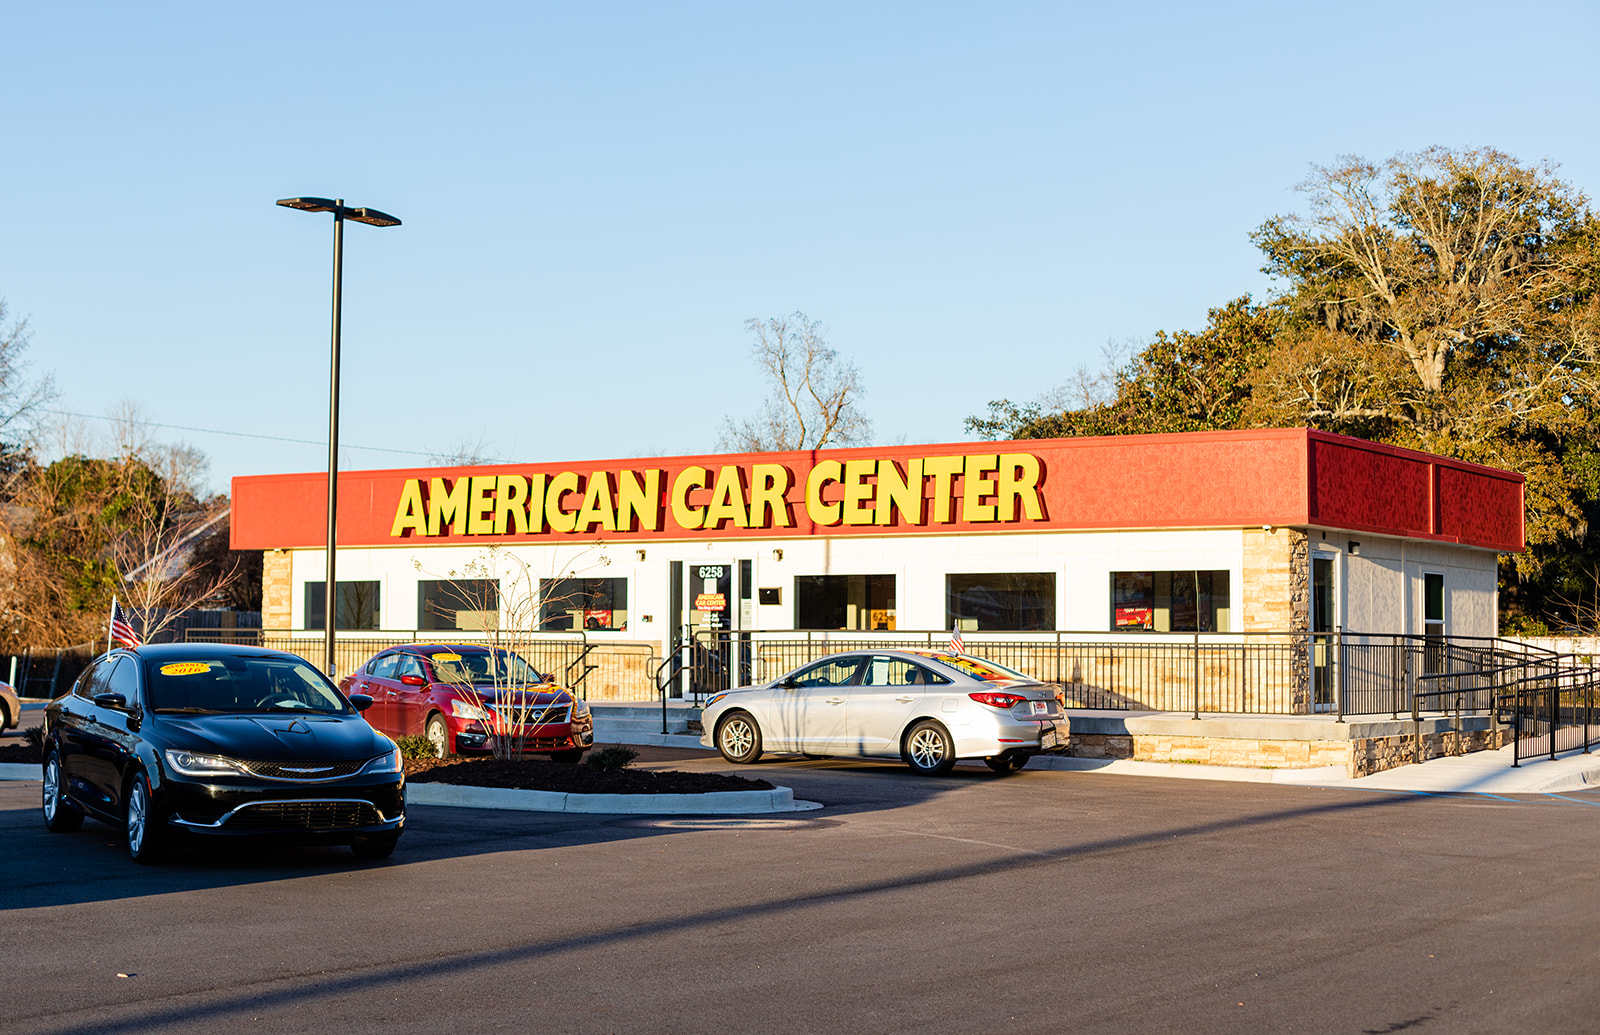 American Car Center Modular Building